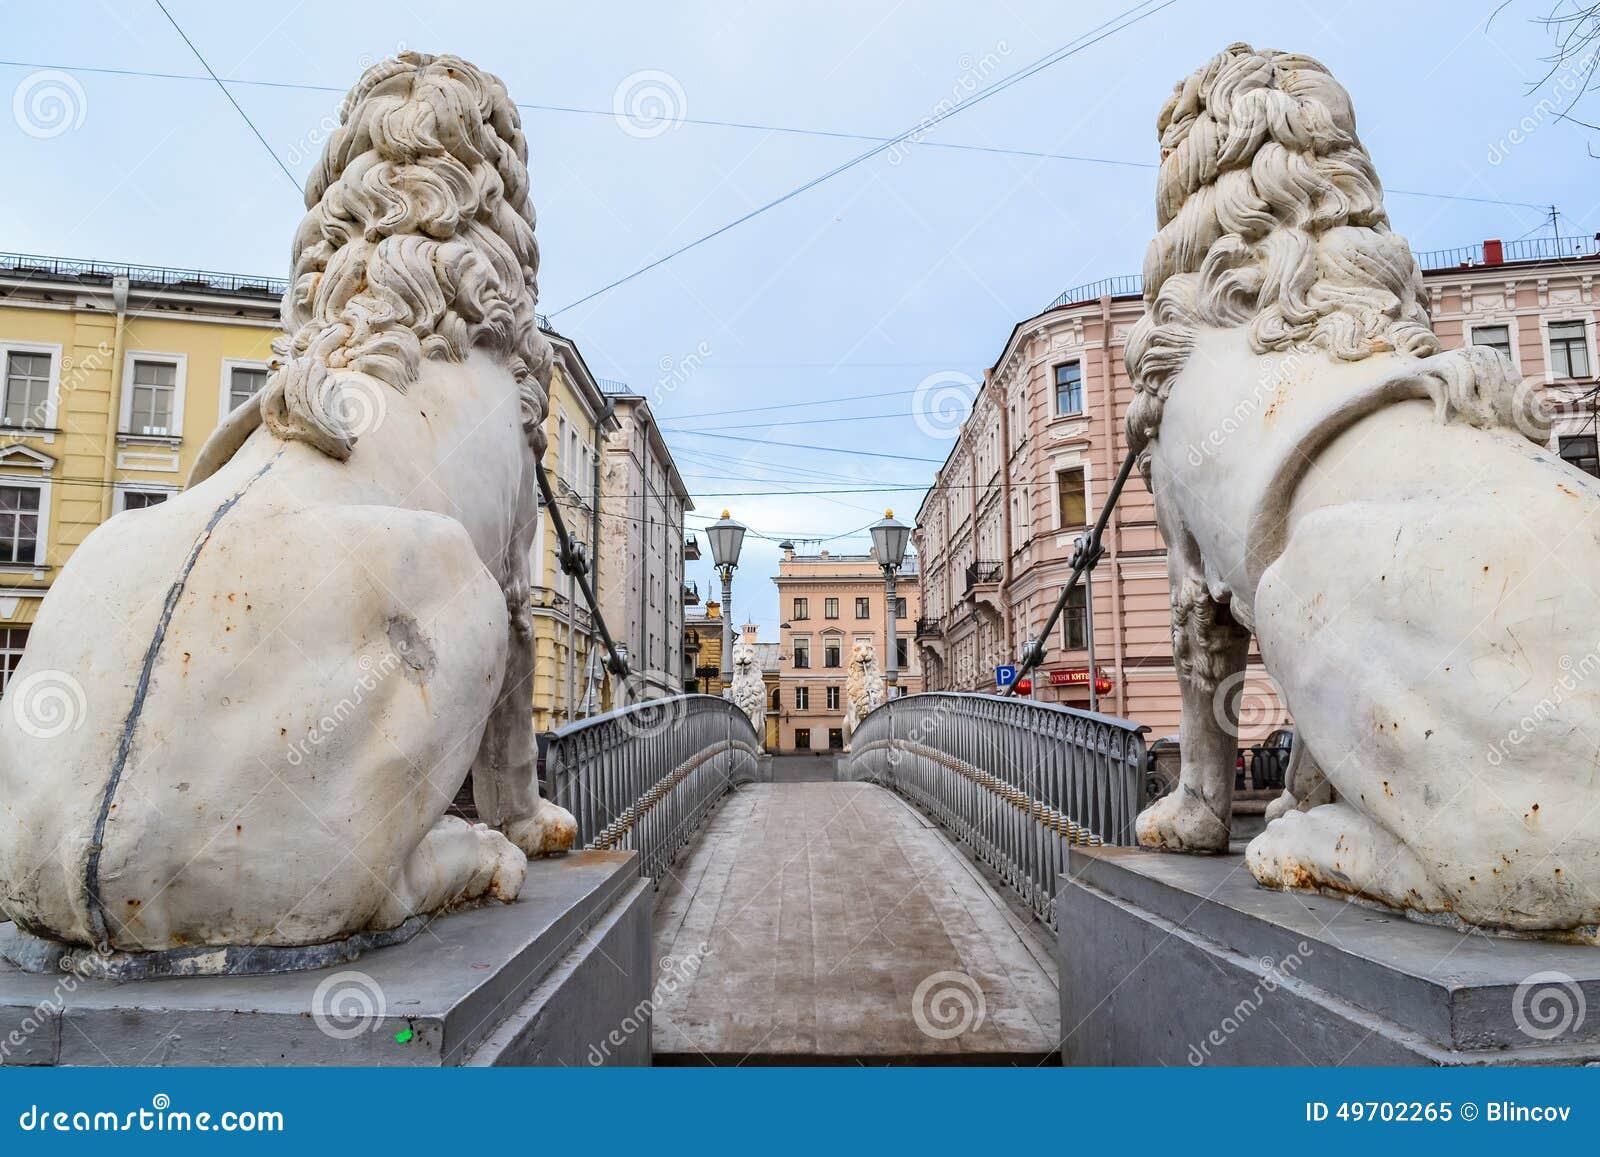 The Lion Bridge in St. Petersburg